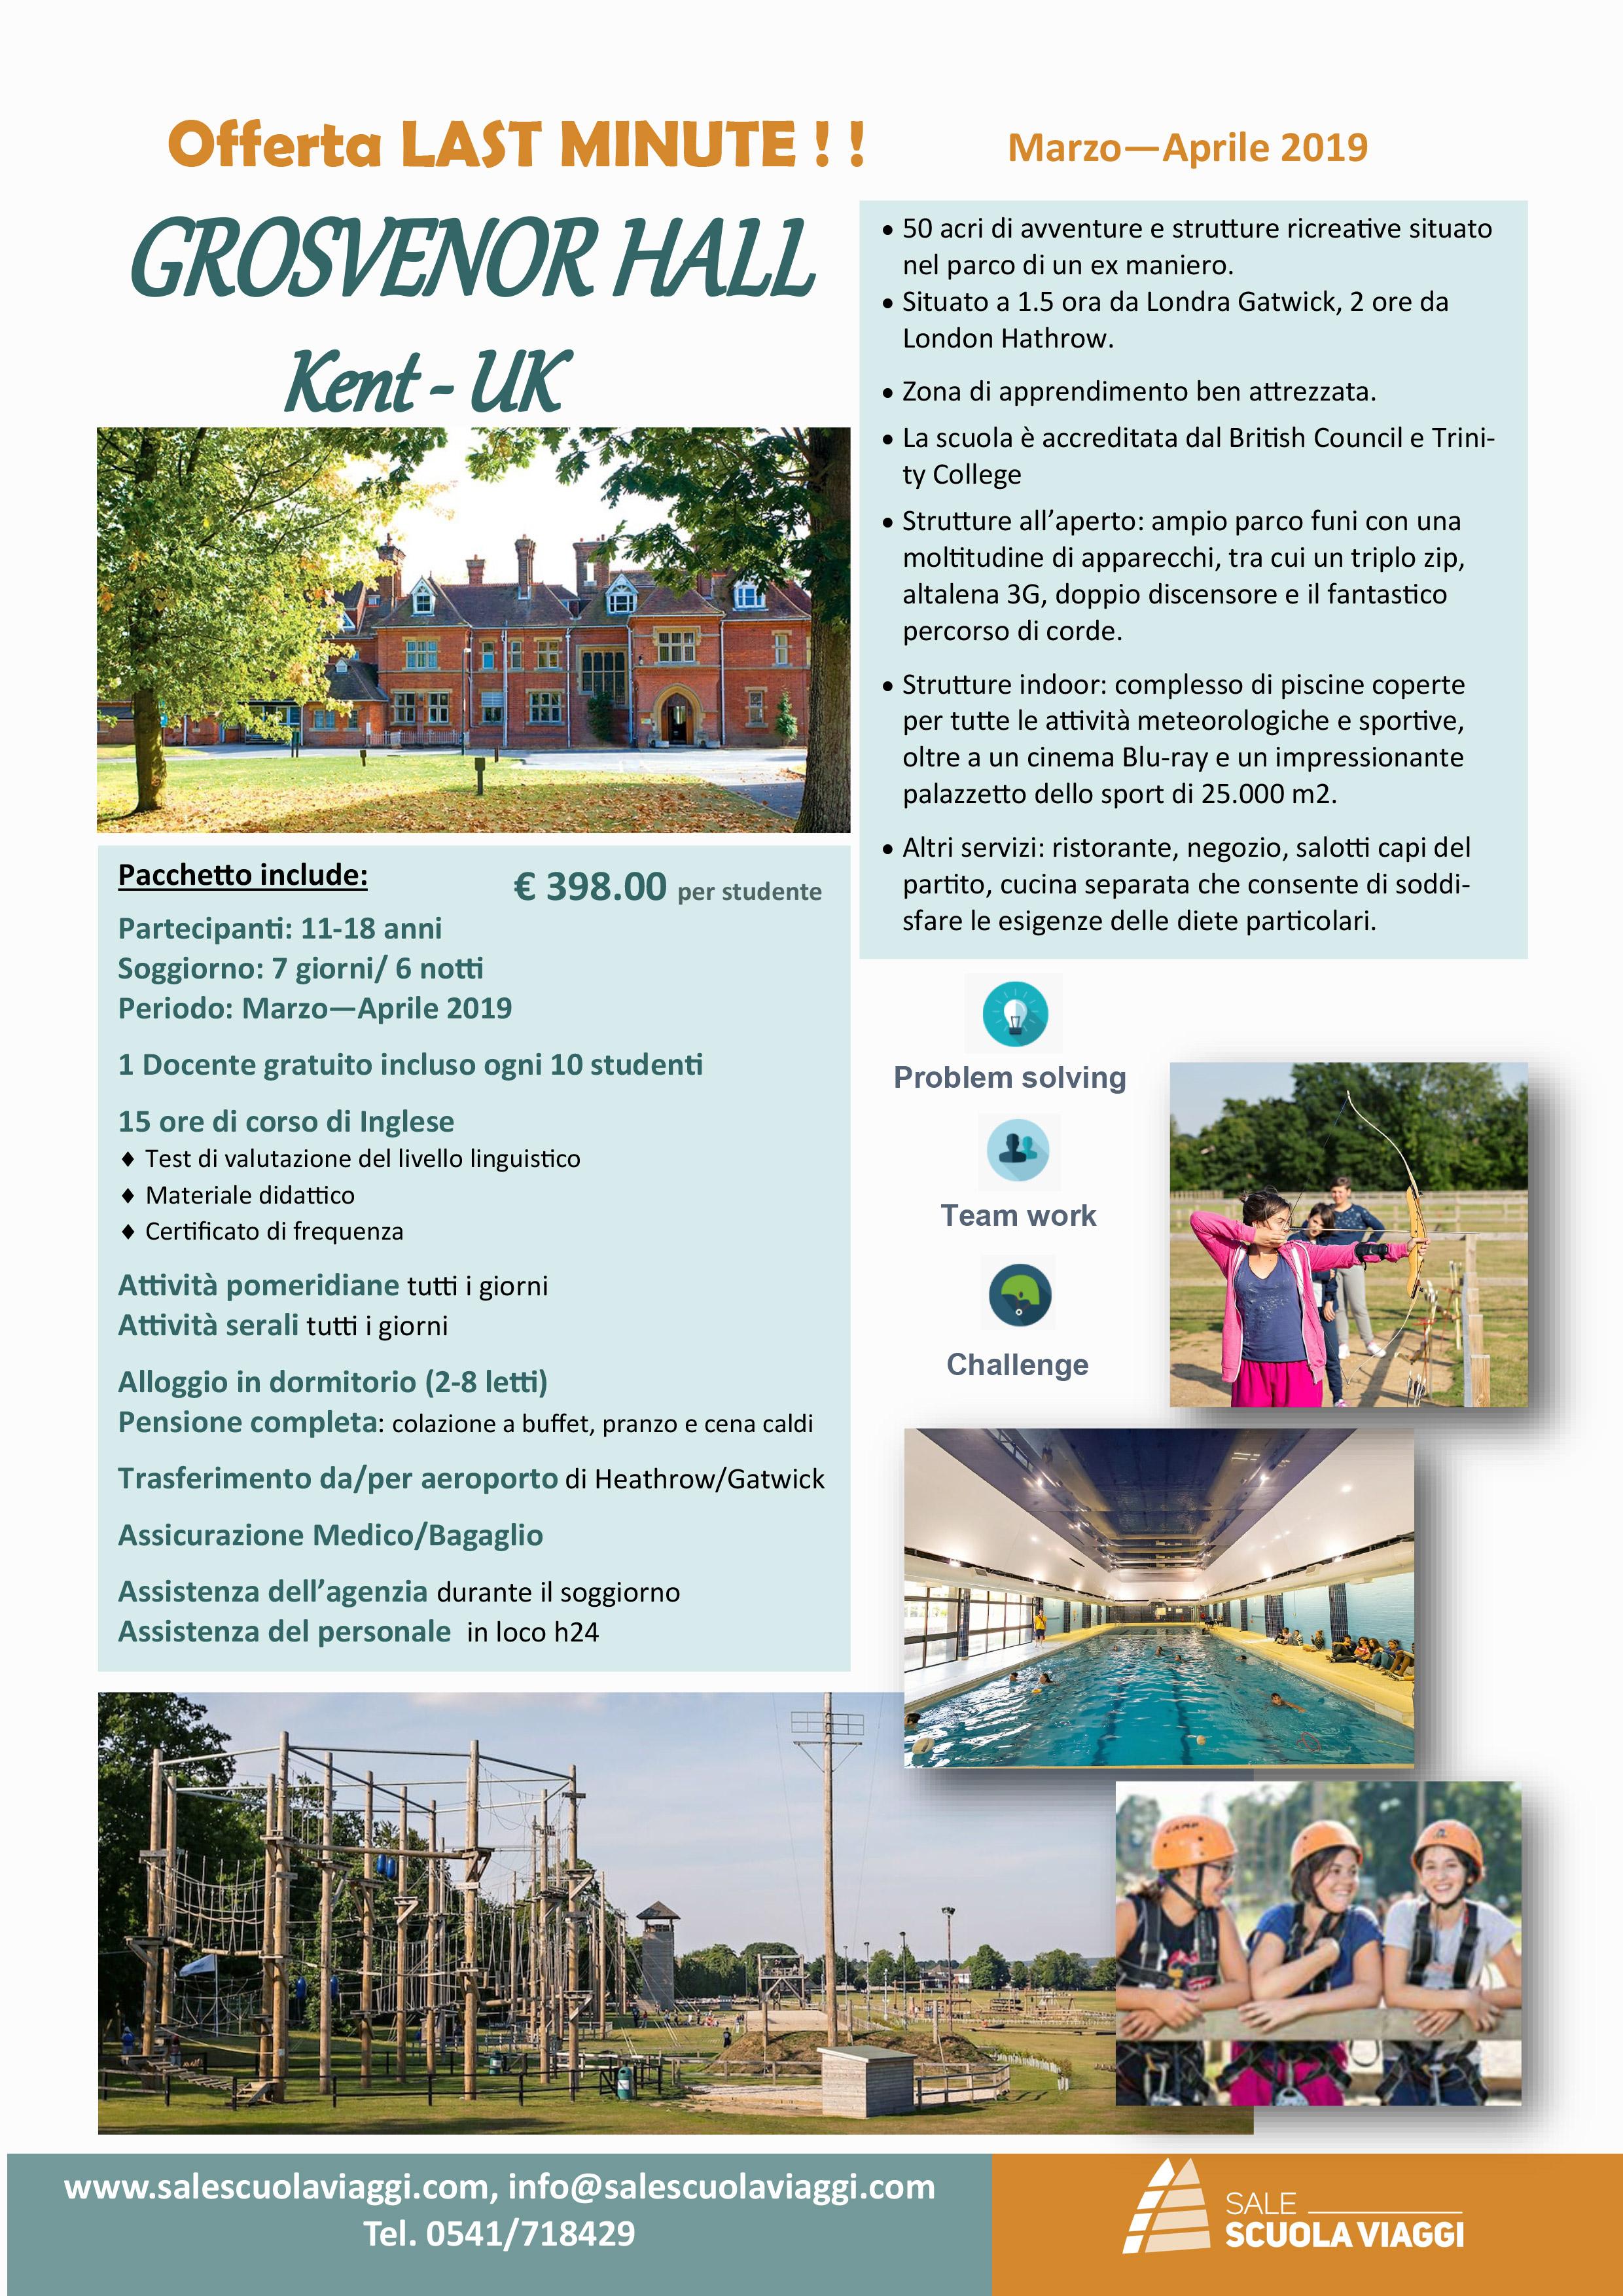 Corso di lingua inglese - Kent - Offerta Last Minute in struttura ...